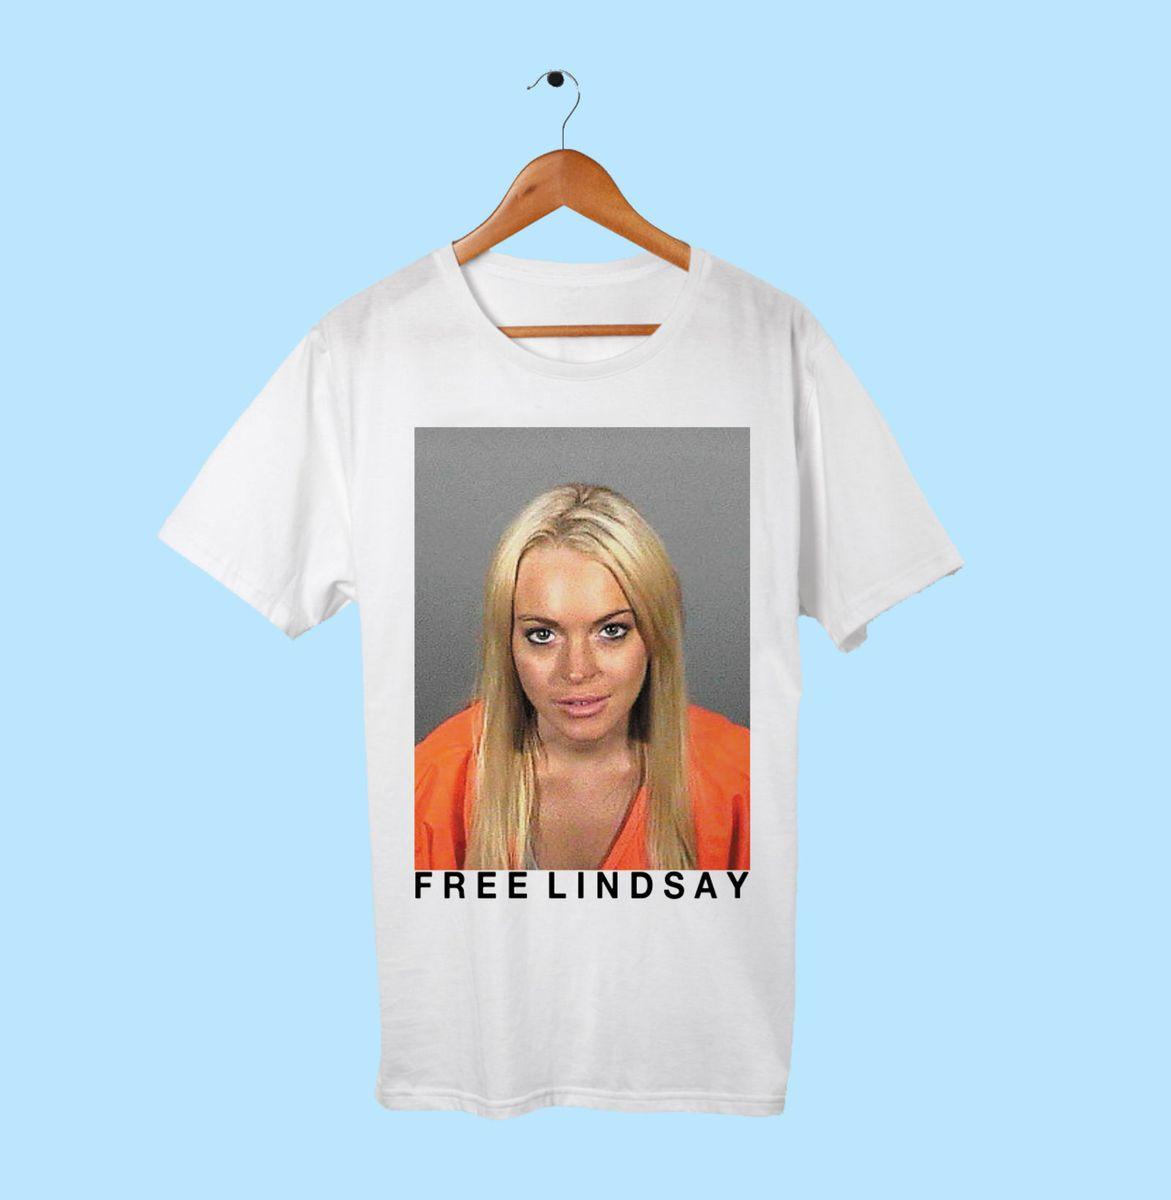 e7d73997c lindsay lohan - camisetas affection store.  Czm6ly9wag90b3muzw5qb2vplmnvbs5ici9wcm9kdwn0cy8yotu3oc9jnduwodg2otflm2rhngrlndmznwe2ntg4yja2ogi3yy5qcgc